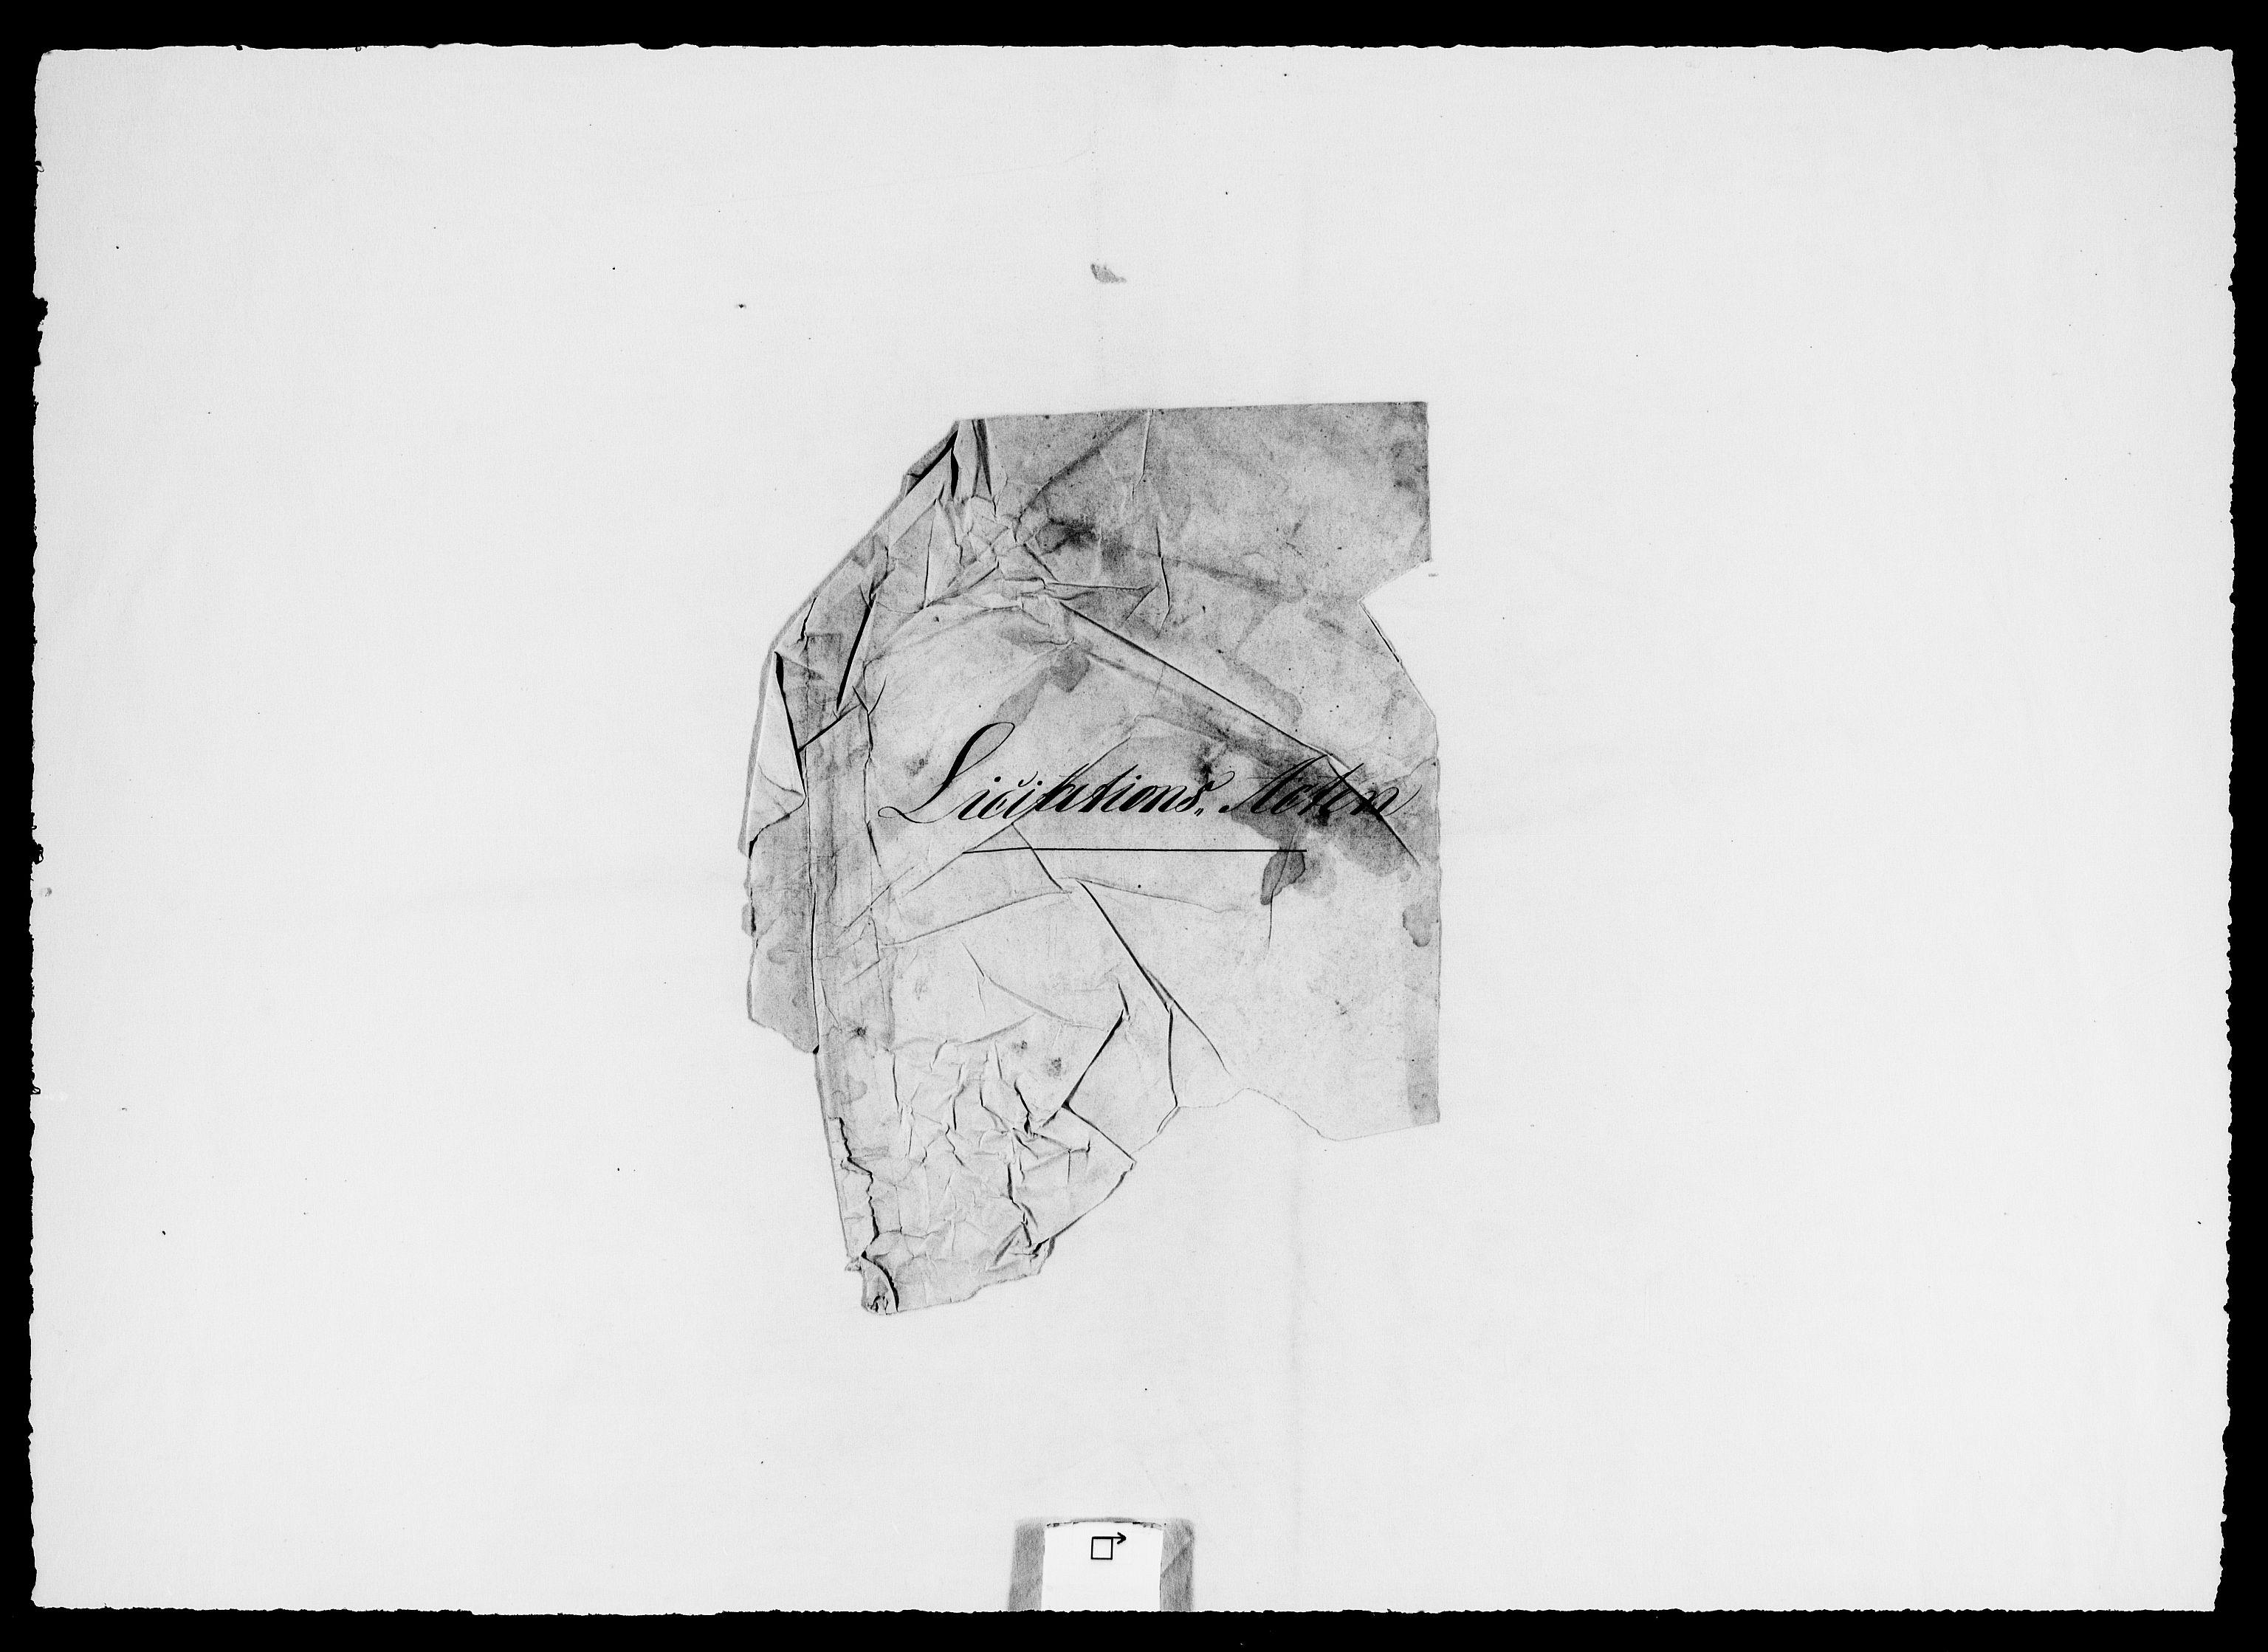 RA, Modums Blaafarveværk, G/Ga/L0063, 1827-1849, s. 2